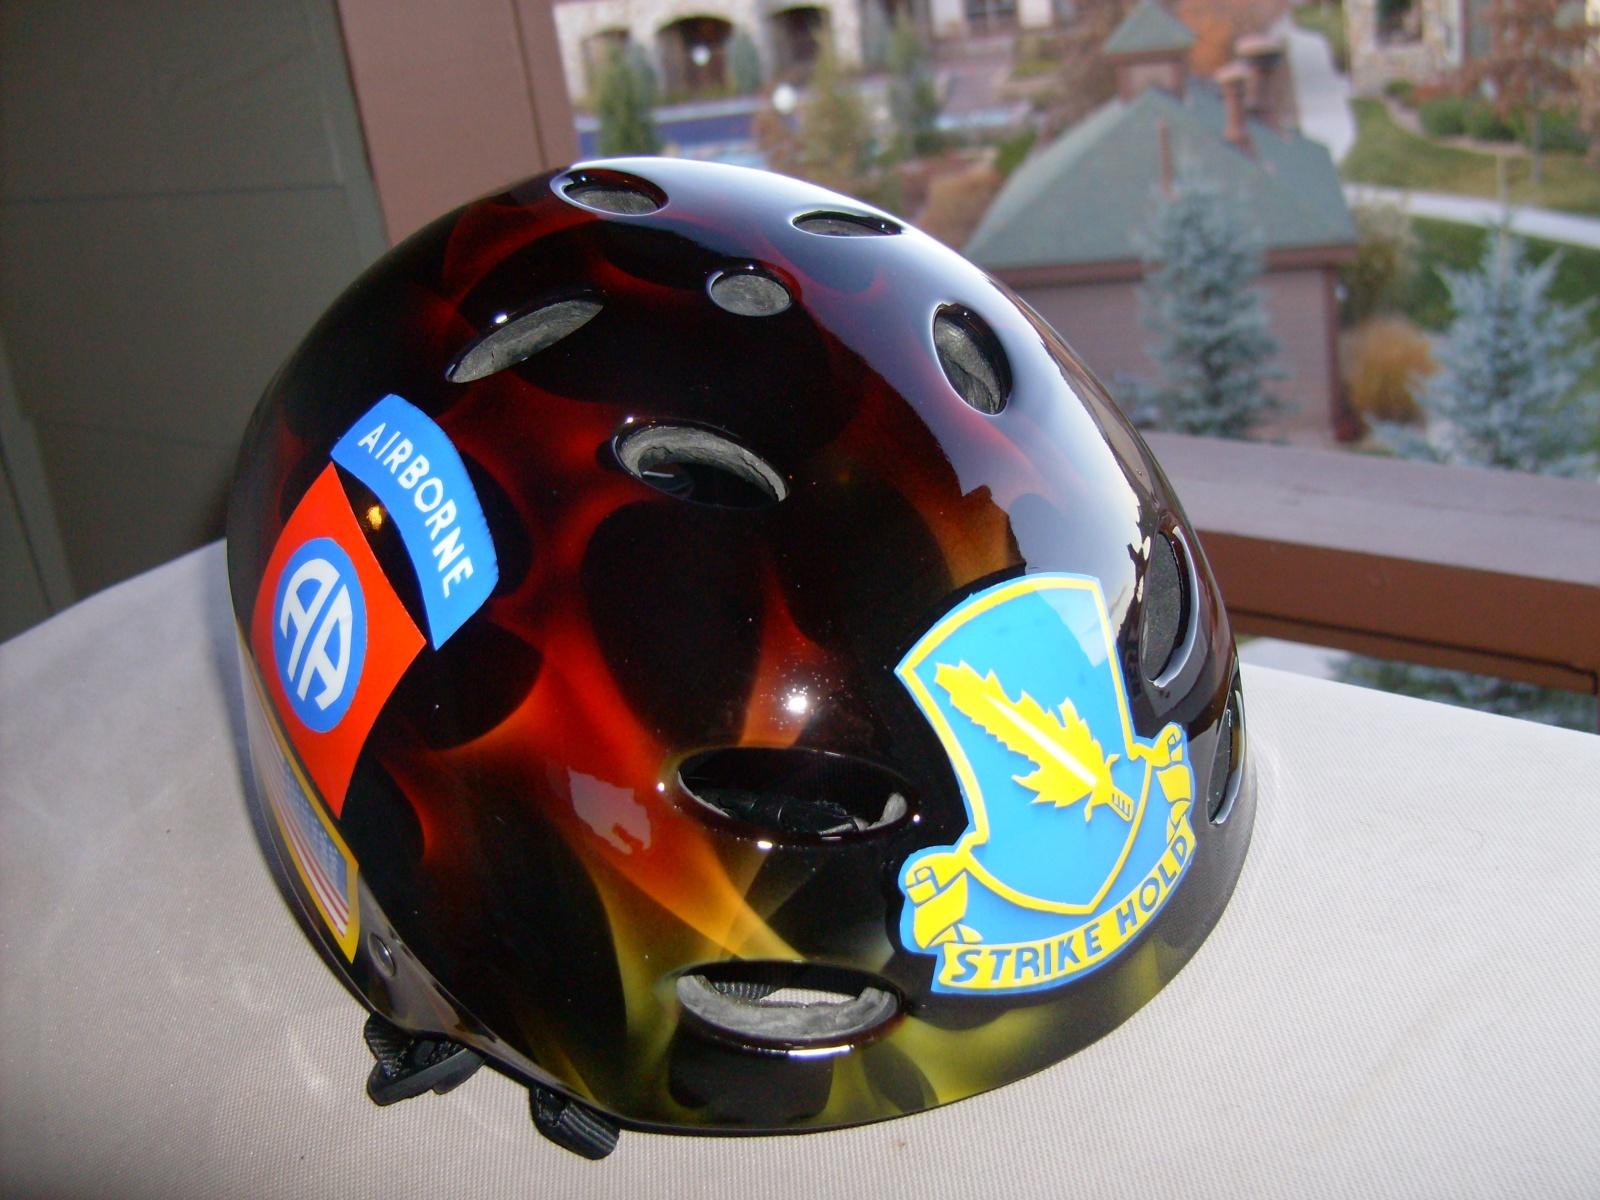 Click image for larger version  Name:Custom kayak helmet 001.jpg Views:289 Size:528.5 KB ID:843